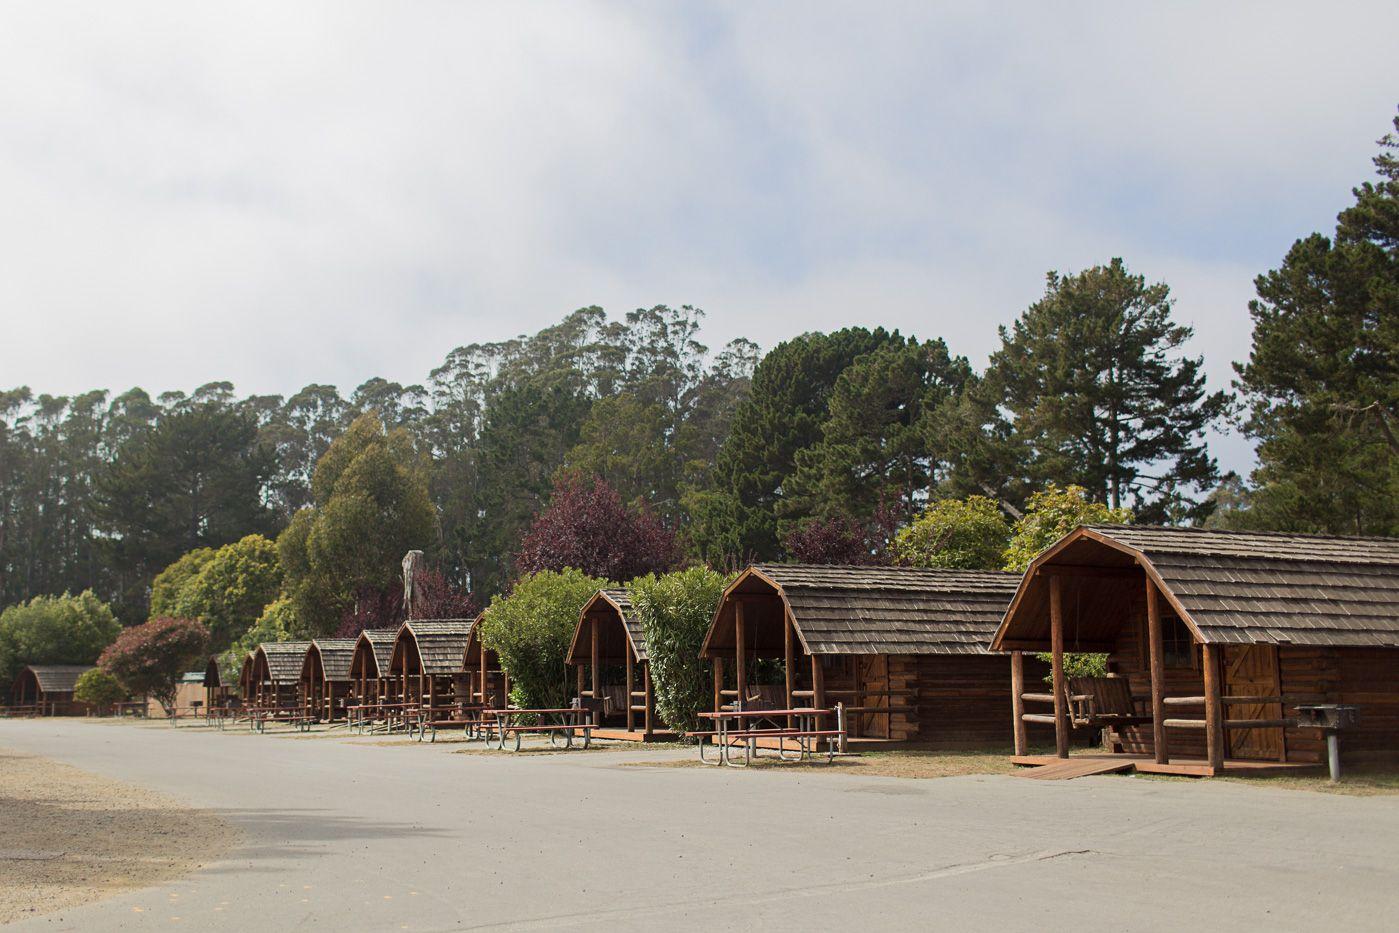 Glamping Cabins At KOA Santa Cruz / Watsonville